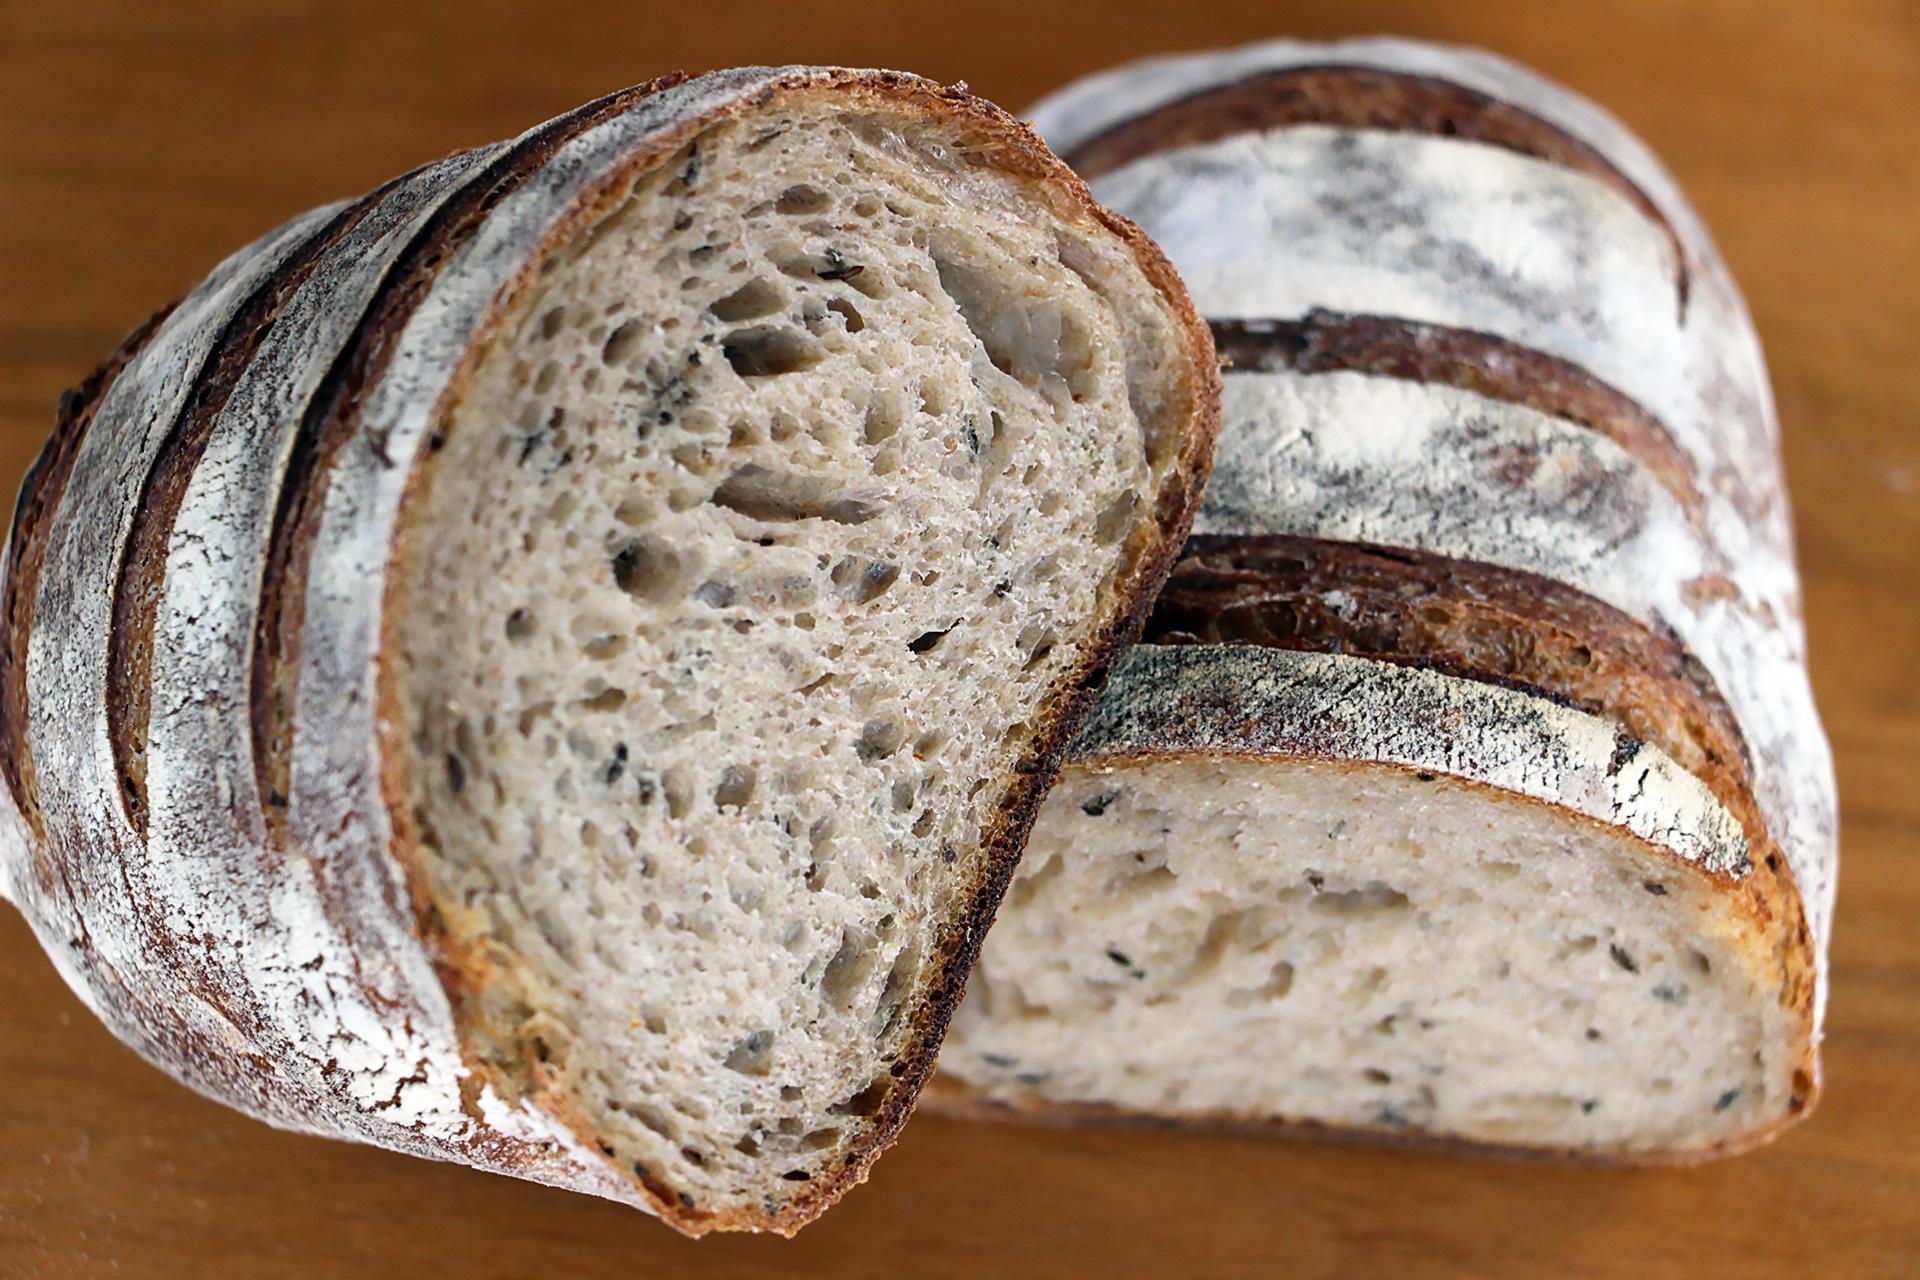 Noe Valley Bakery rye bread interior.